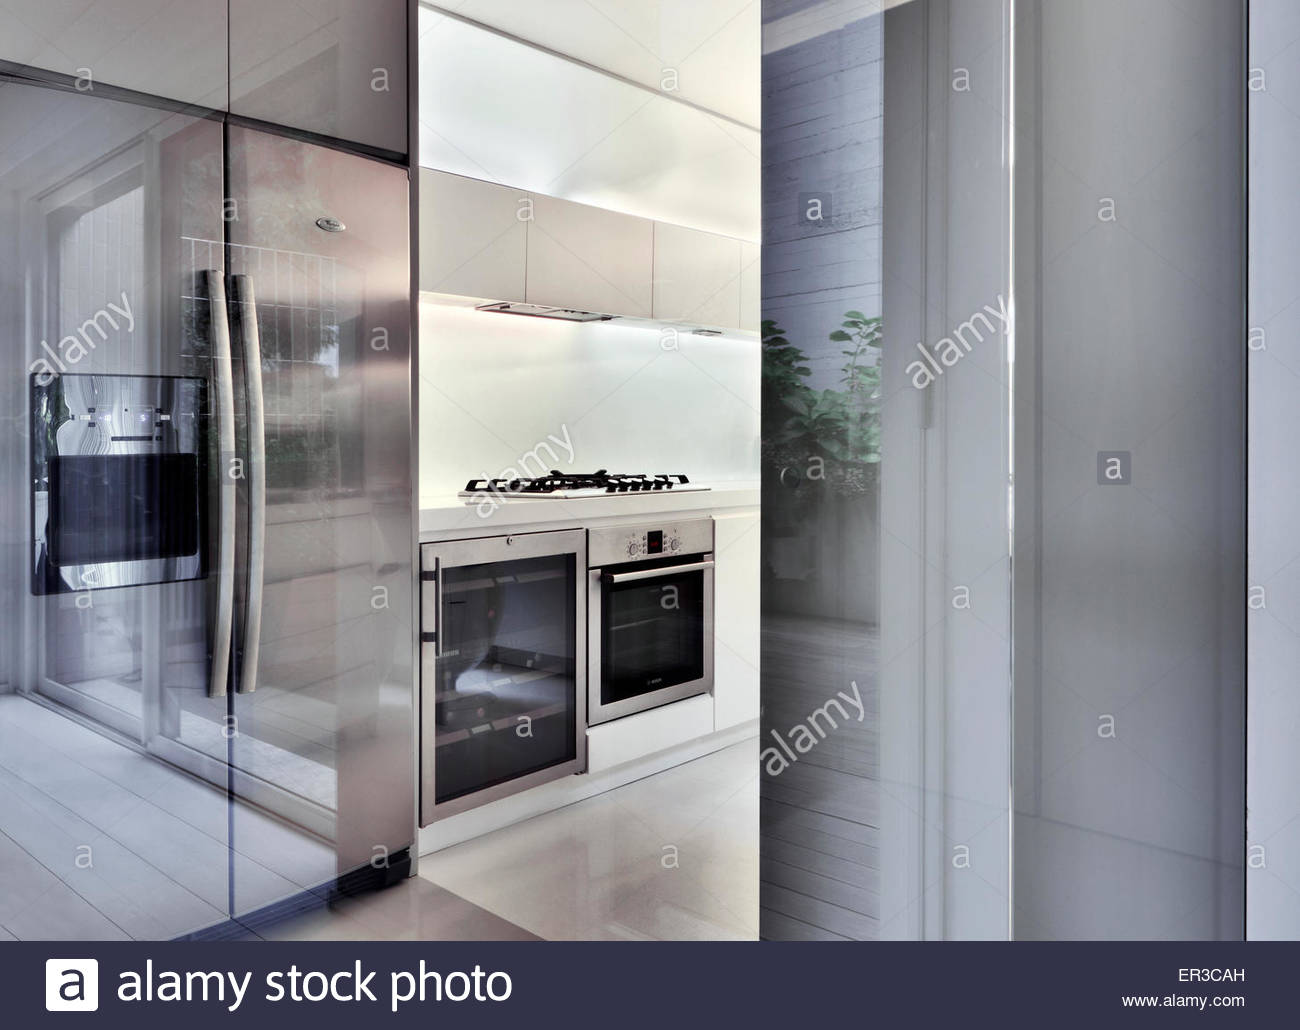 Stainless Steel Appliances Stockfotos & Stainless Steel Appliances ...